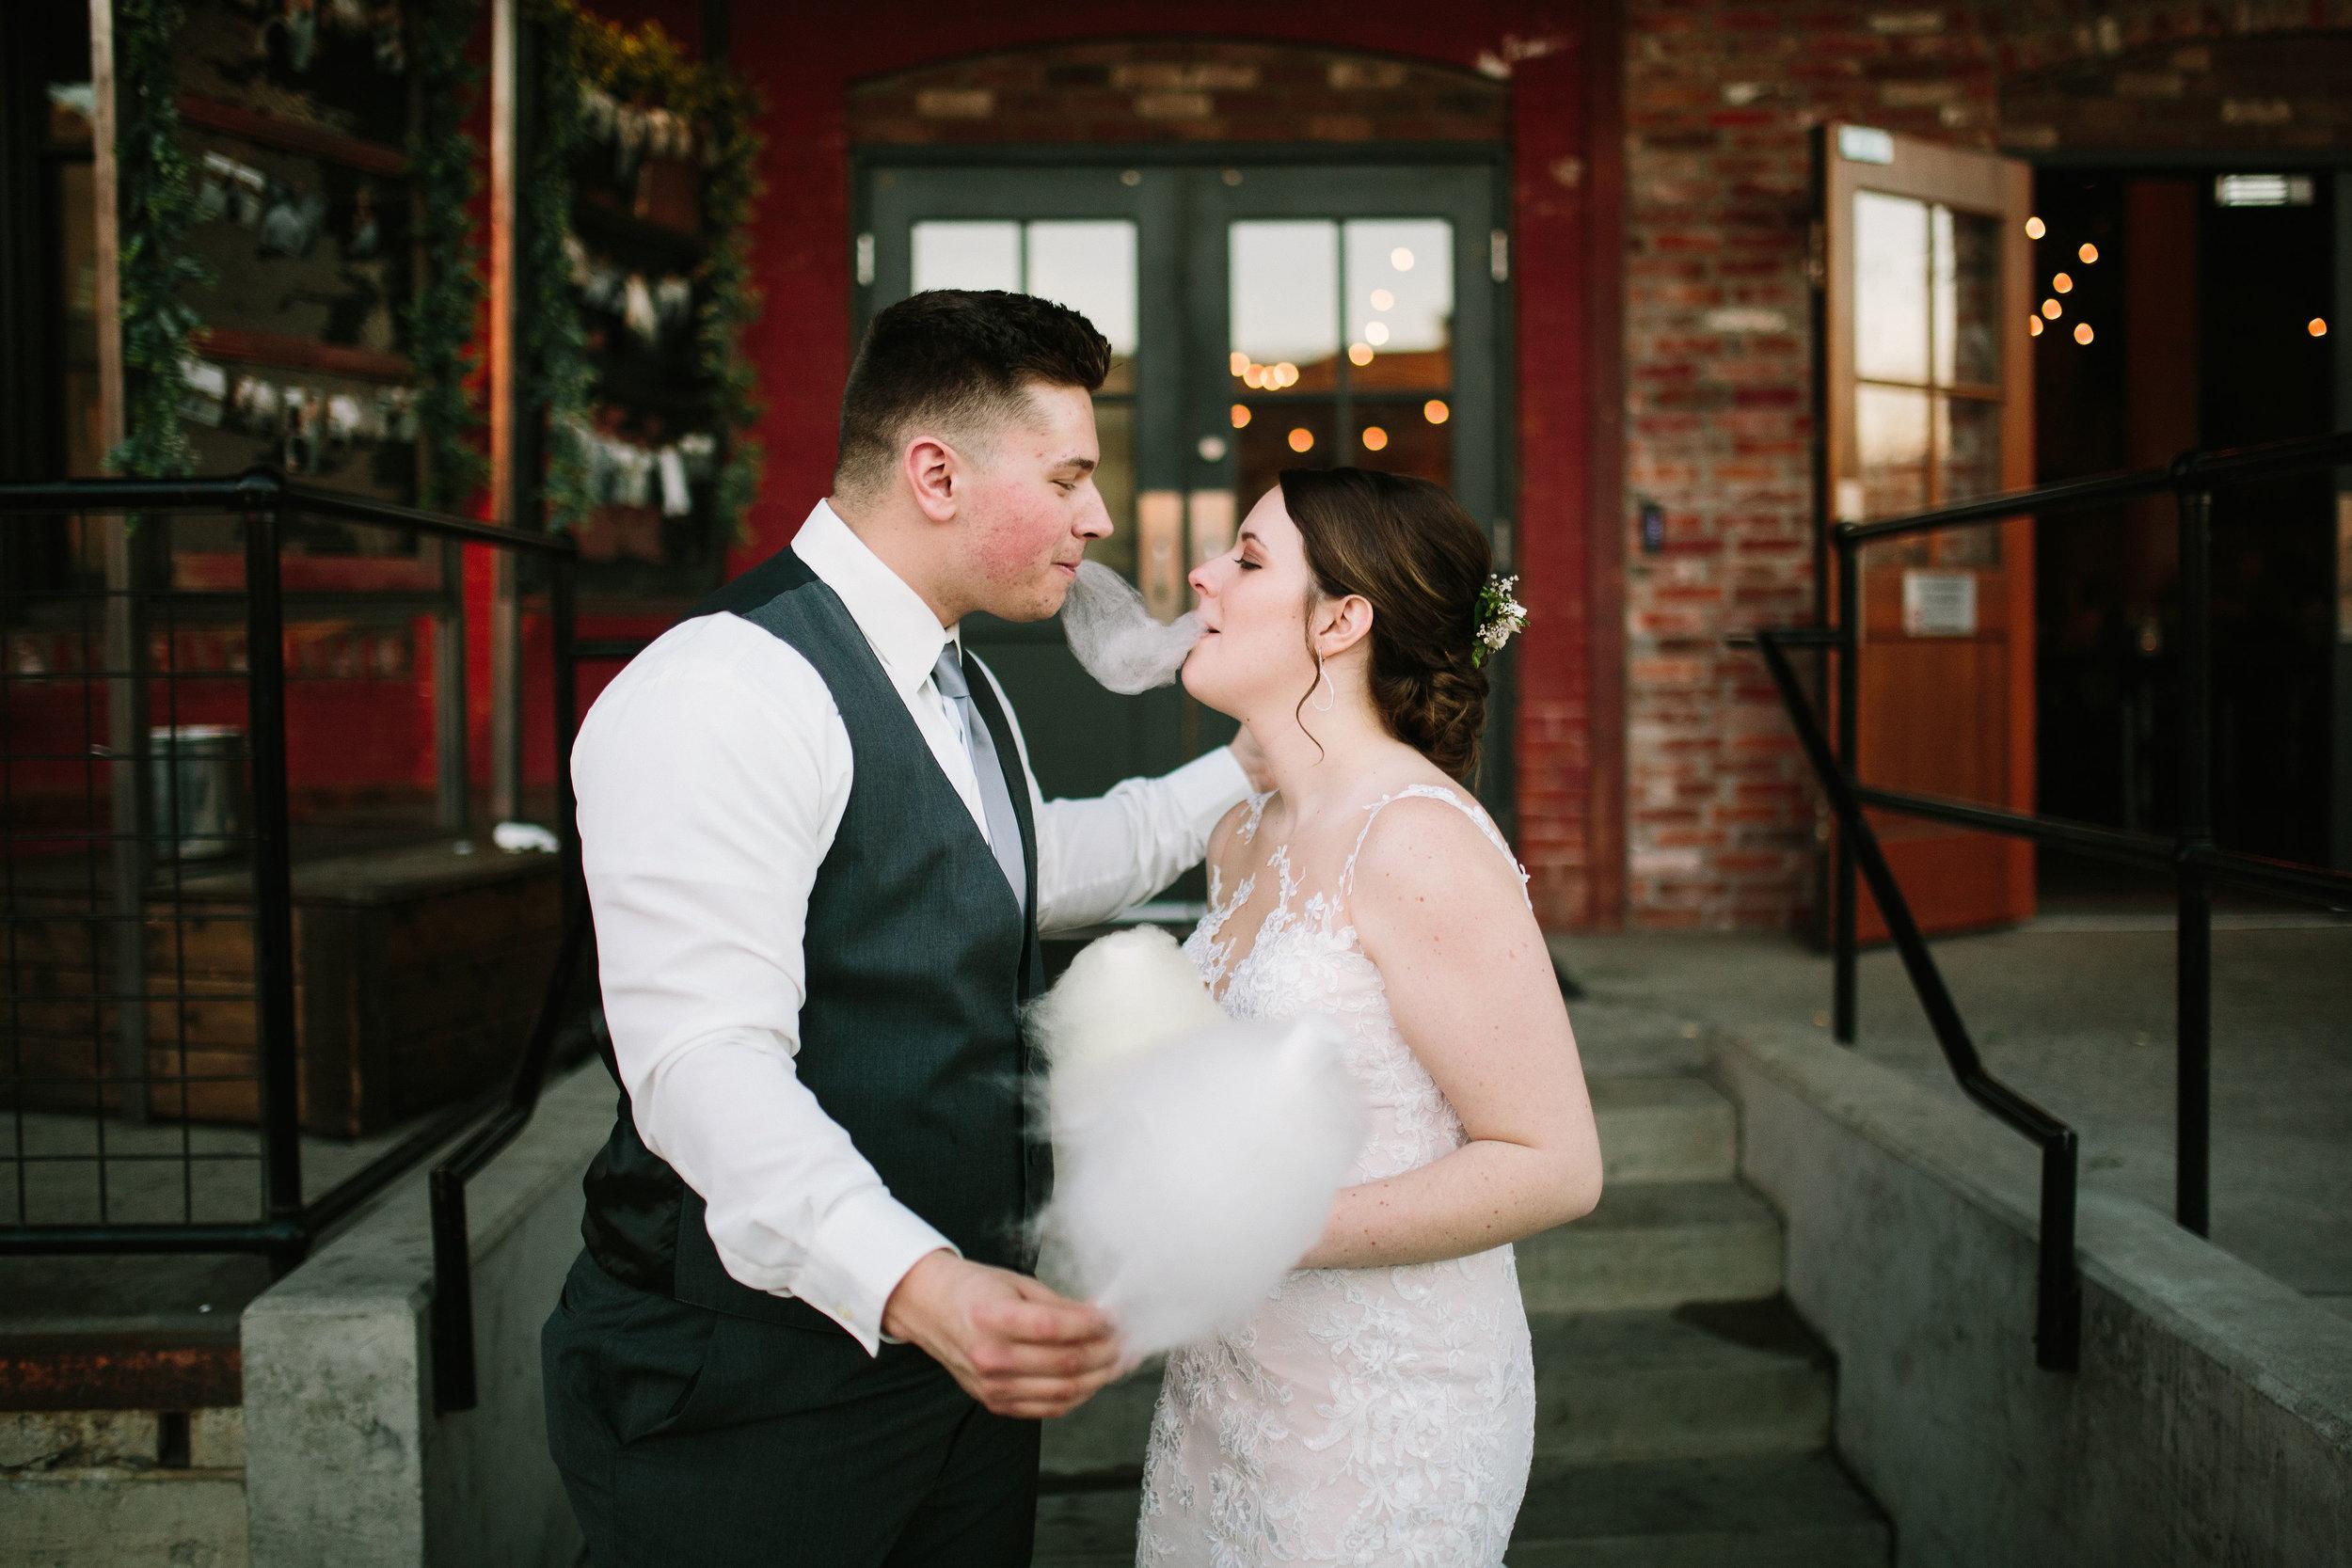 Fun Rustic spokane wedding bride groom sharing cotton candy